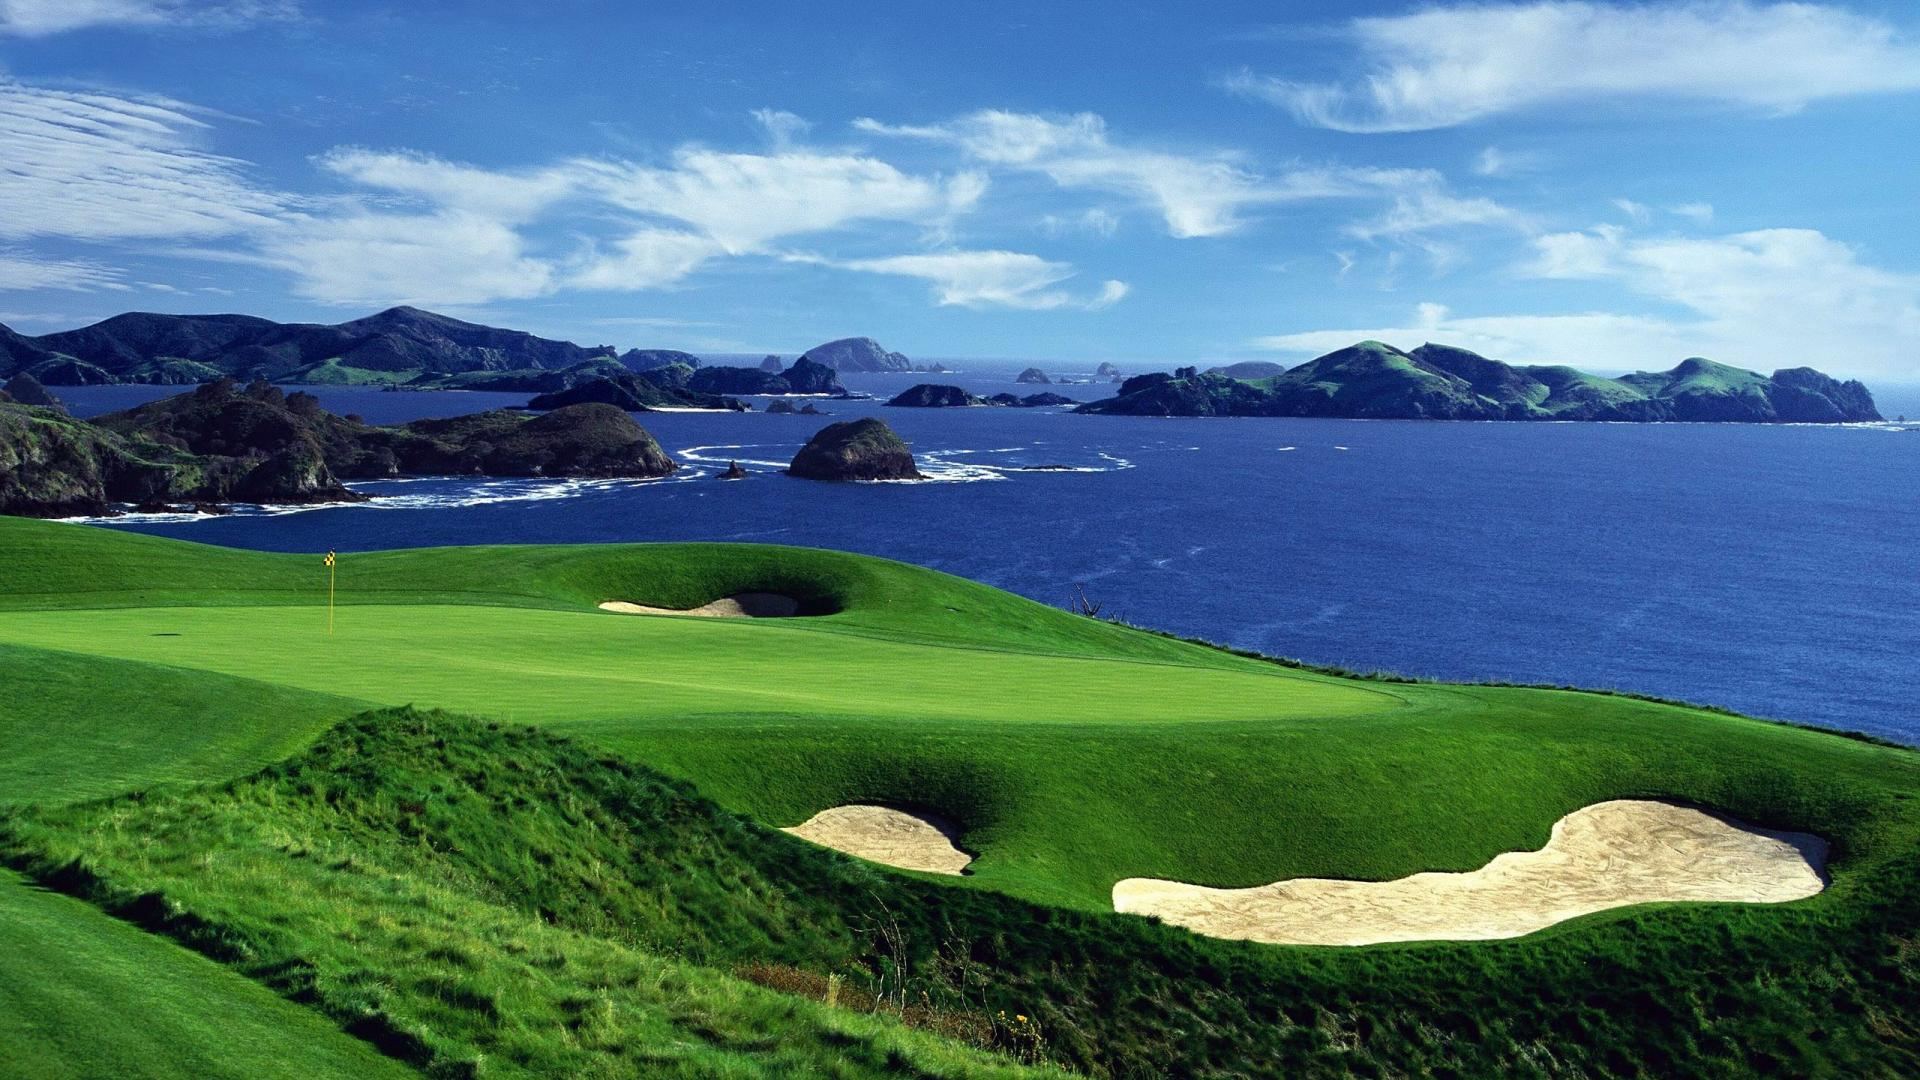 HD Golf Desktop Wallpaper - 52DazheW Gallery